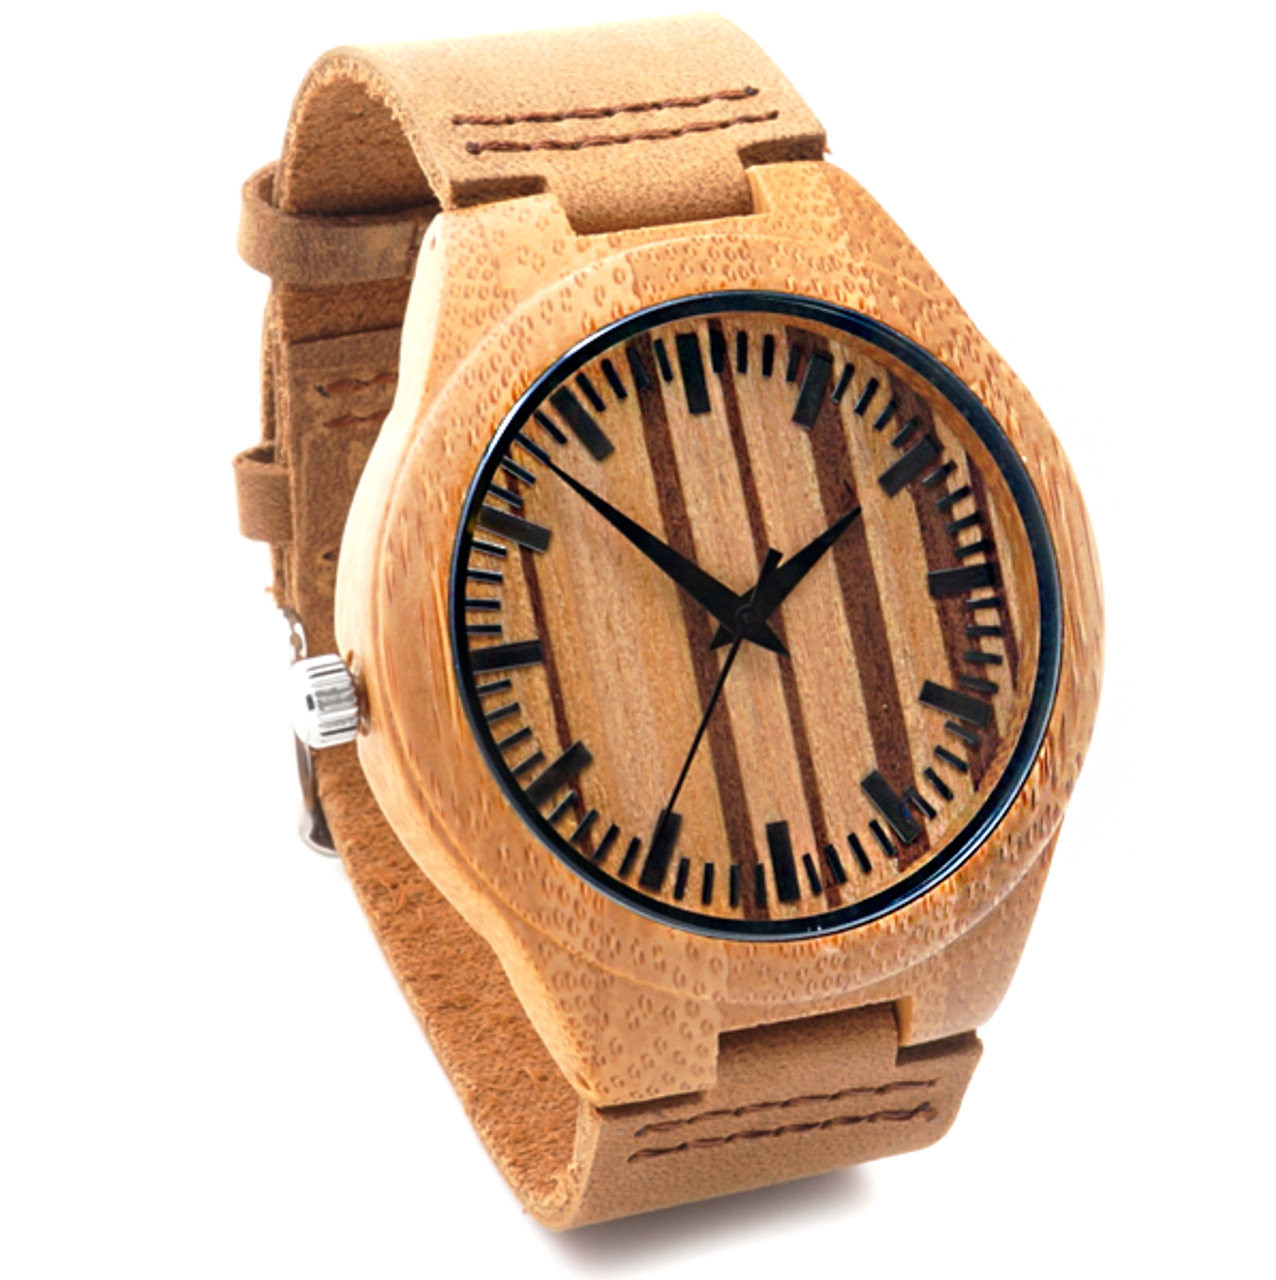 Grpn BE - Wood Engraved Watch W#58 - PinStripe